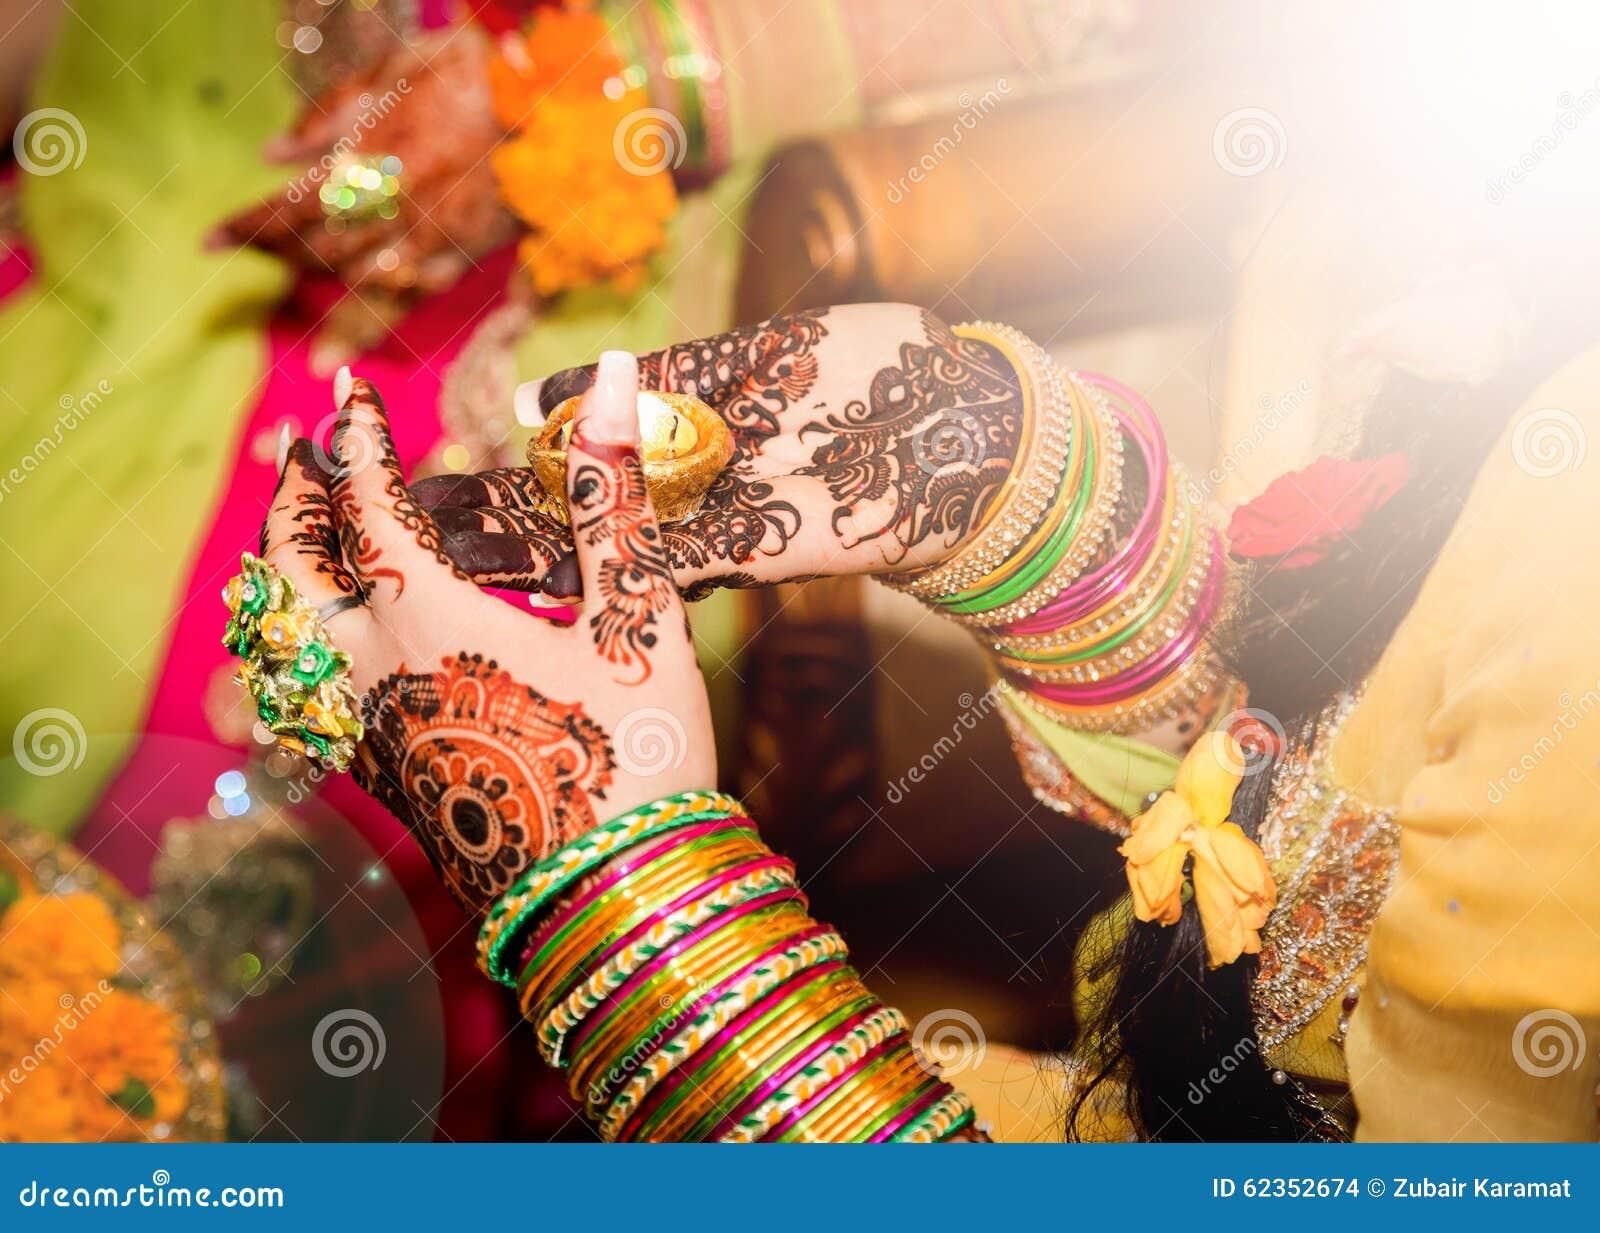 Finally Focus On Asian Brides 115